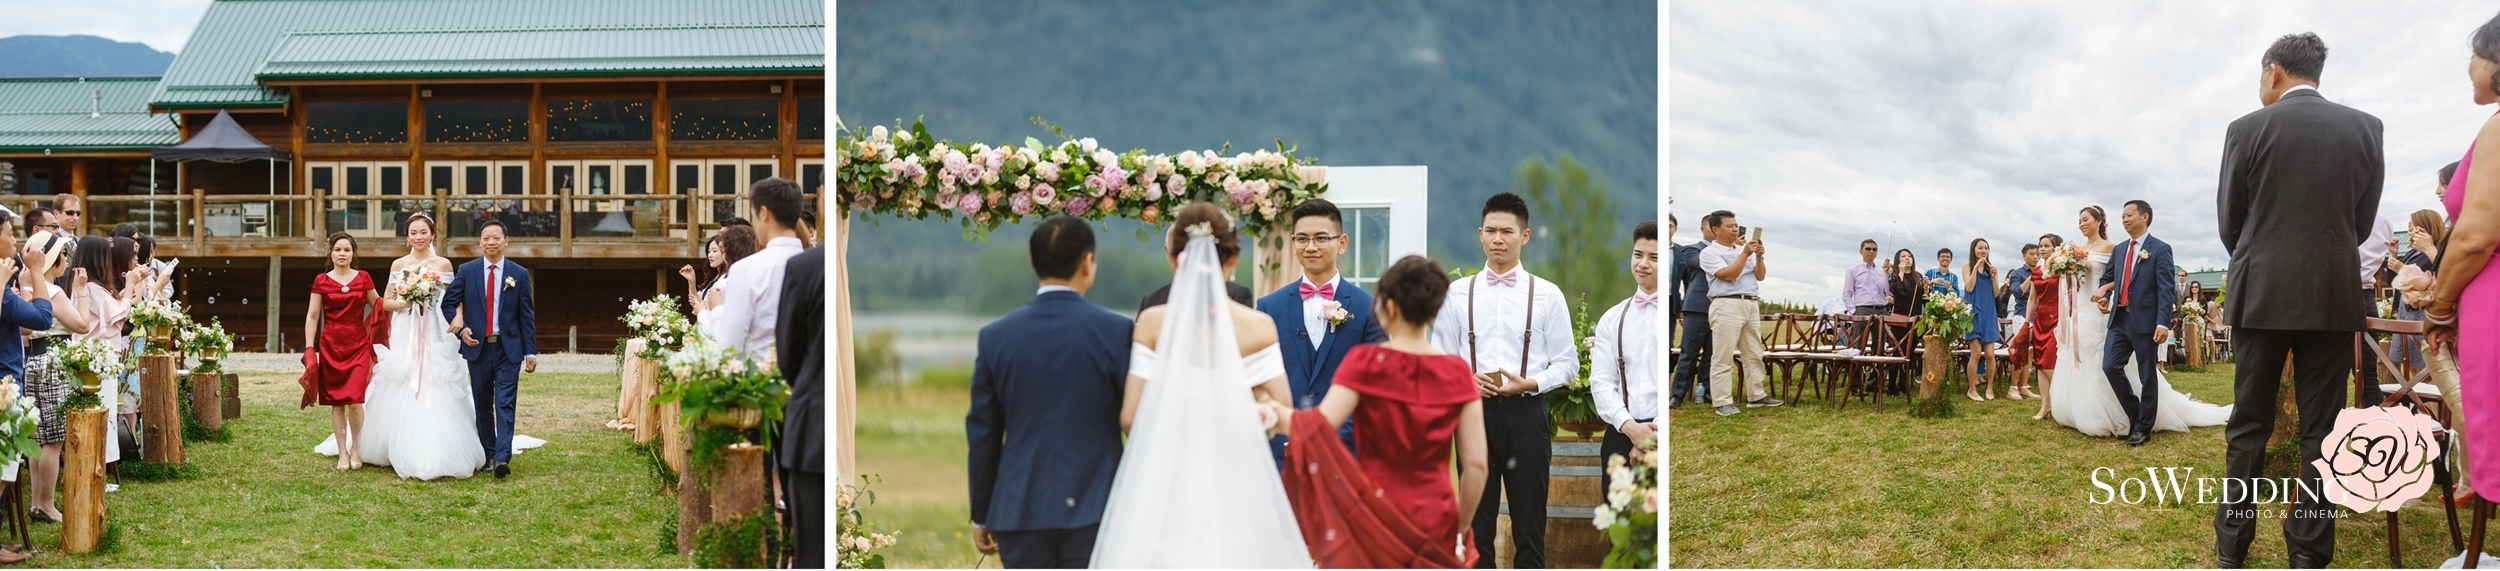 Janet&Kevin-Wedding-HL-HD-0178